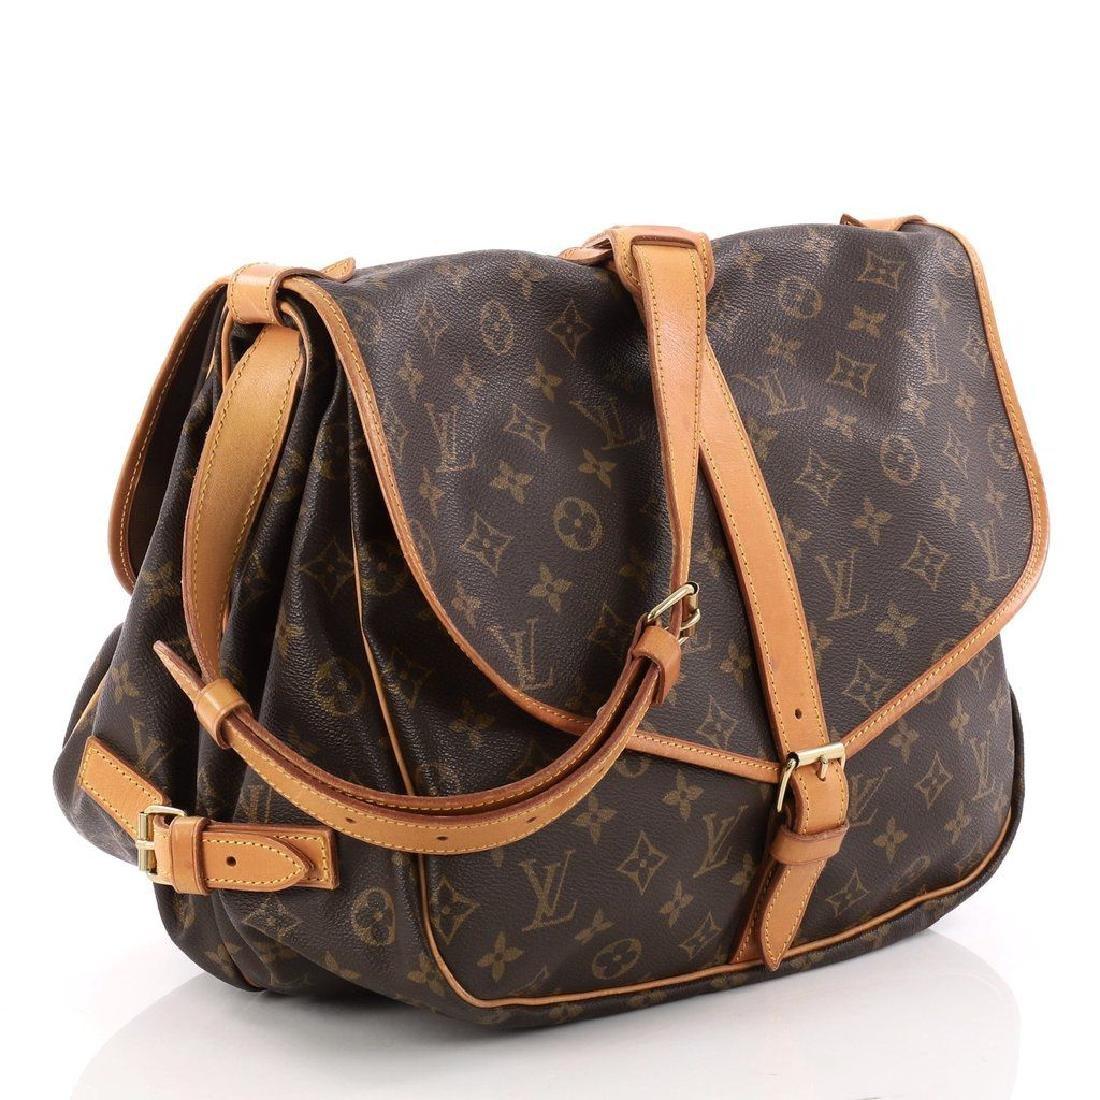 Louis Vuitton Monogram Saumur 35 GM Postal Shoulder Bag